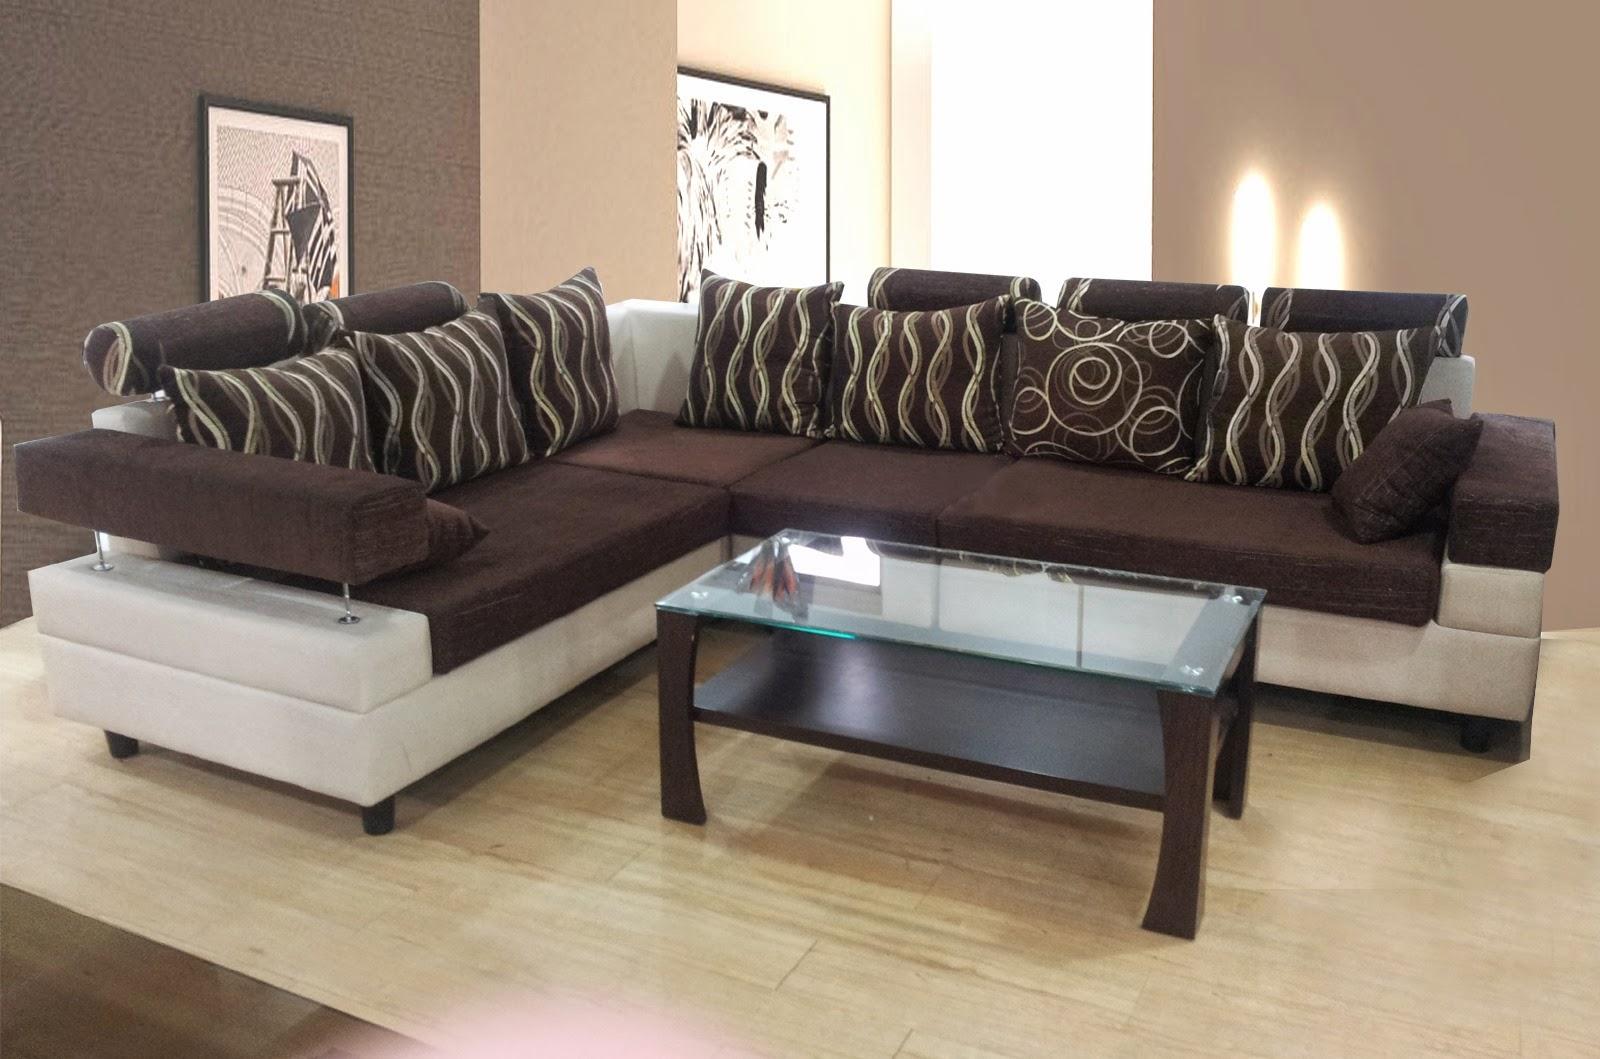 Dining Room Set For 6 Latest Sofa Designs In Kenya Sofa Design